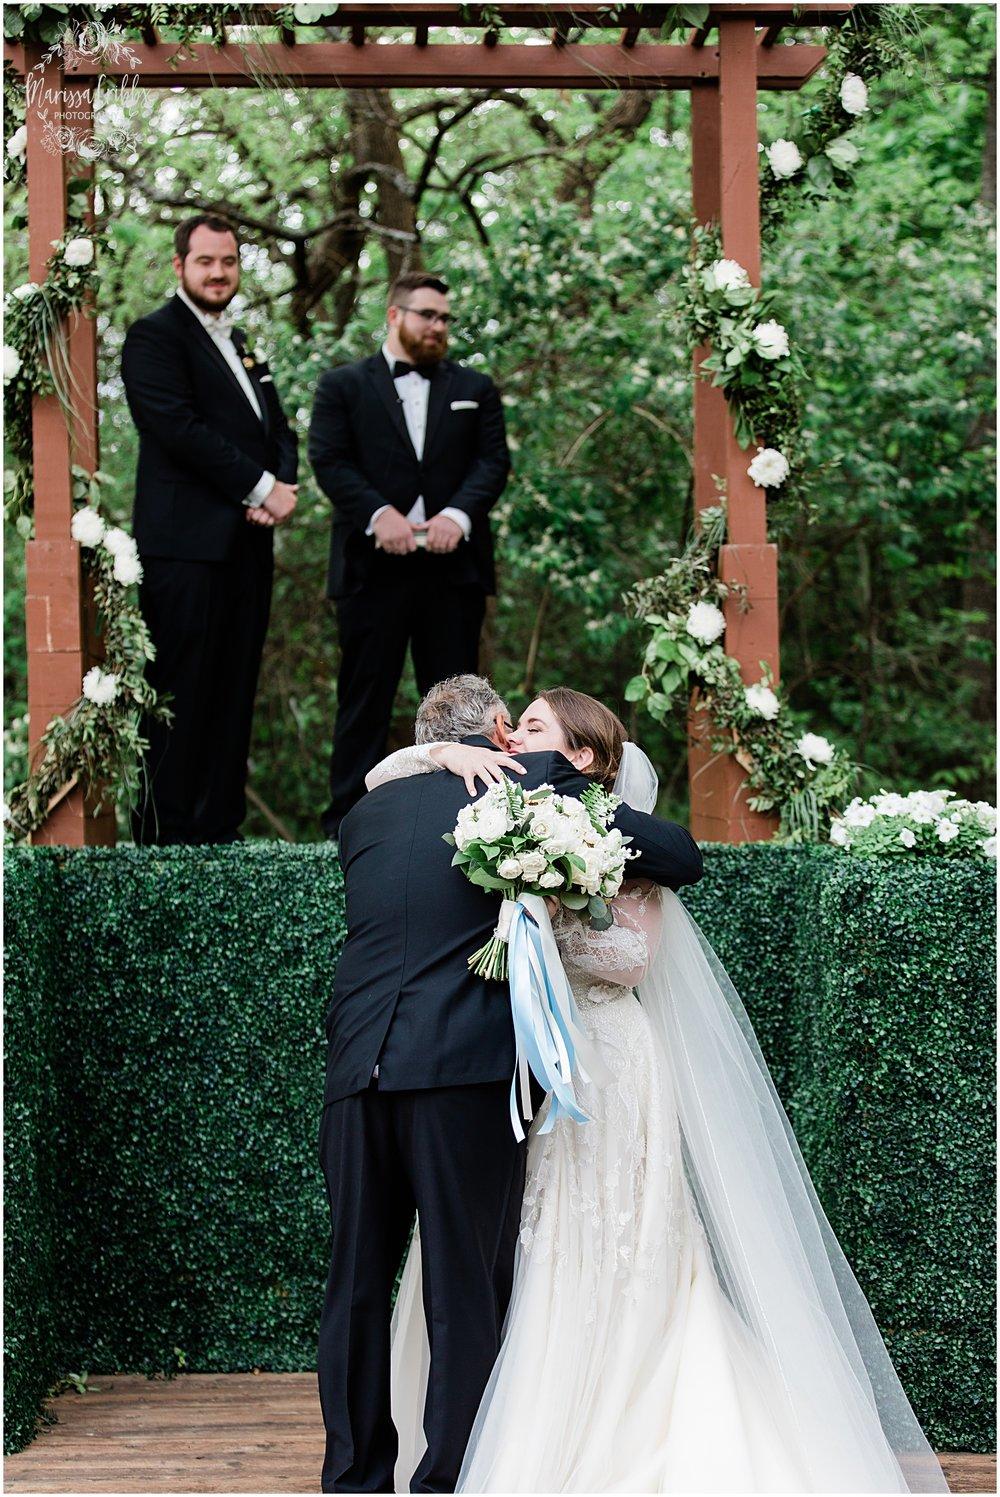 GORBY WEDDING | MARISSA CRIBBS PHOTOGRAPHY_5056.jpg